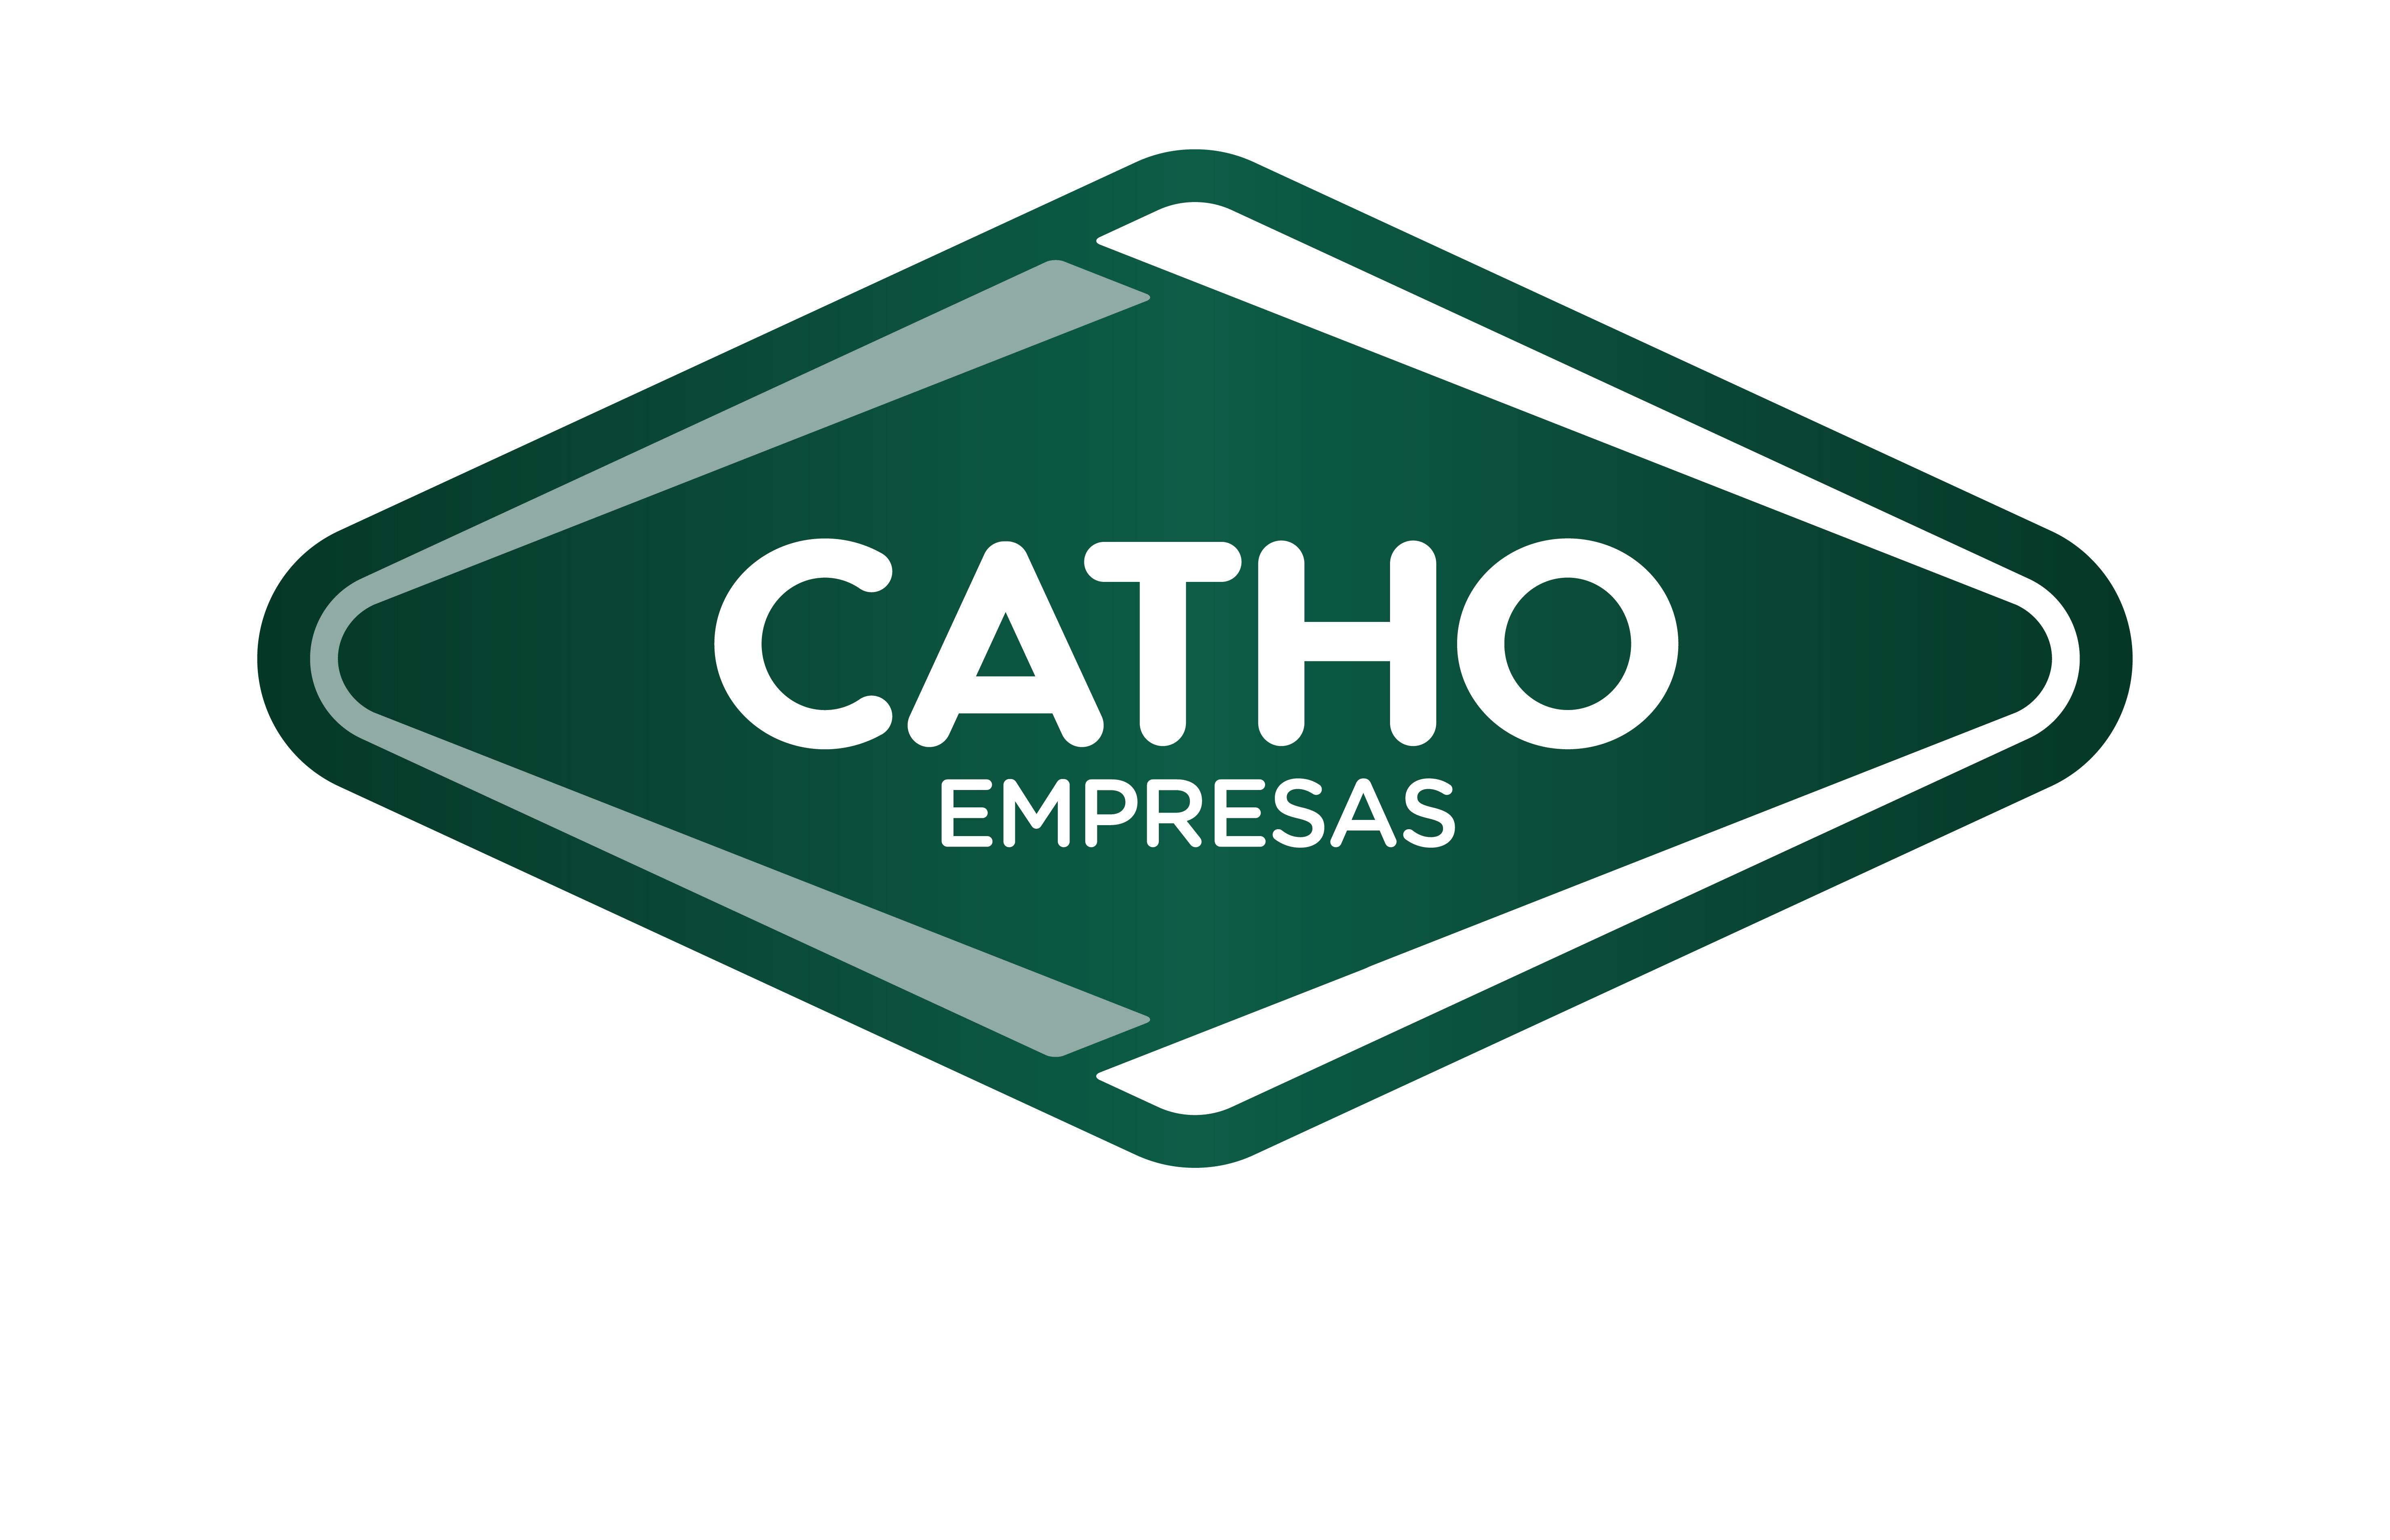 File:Logo catho empresas.jpg